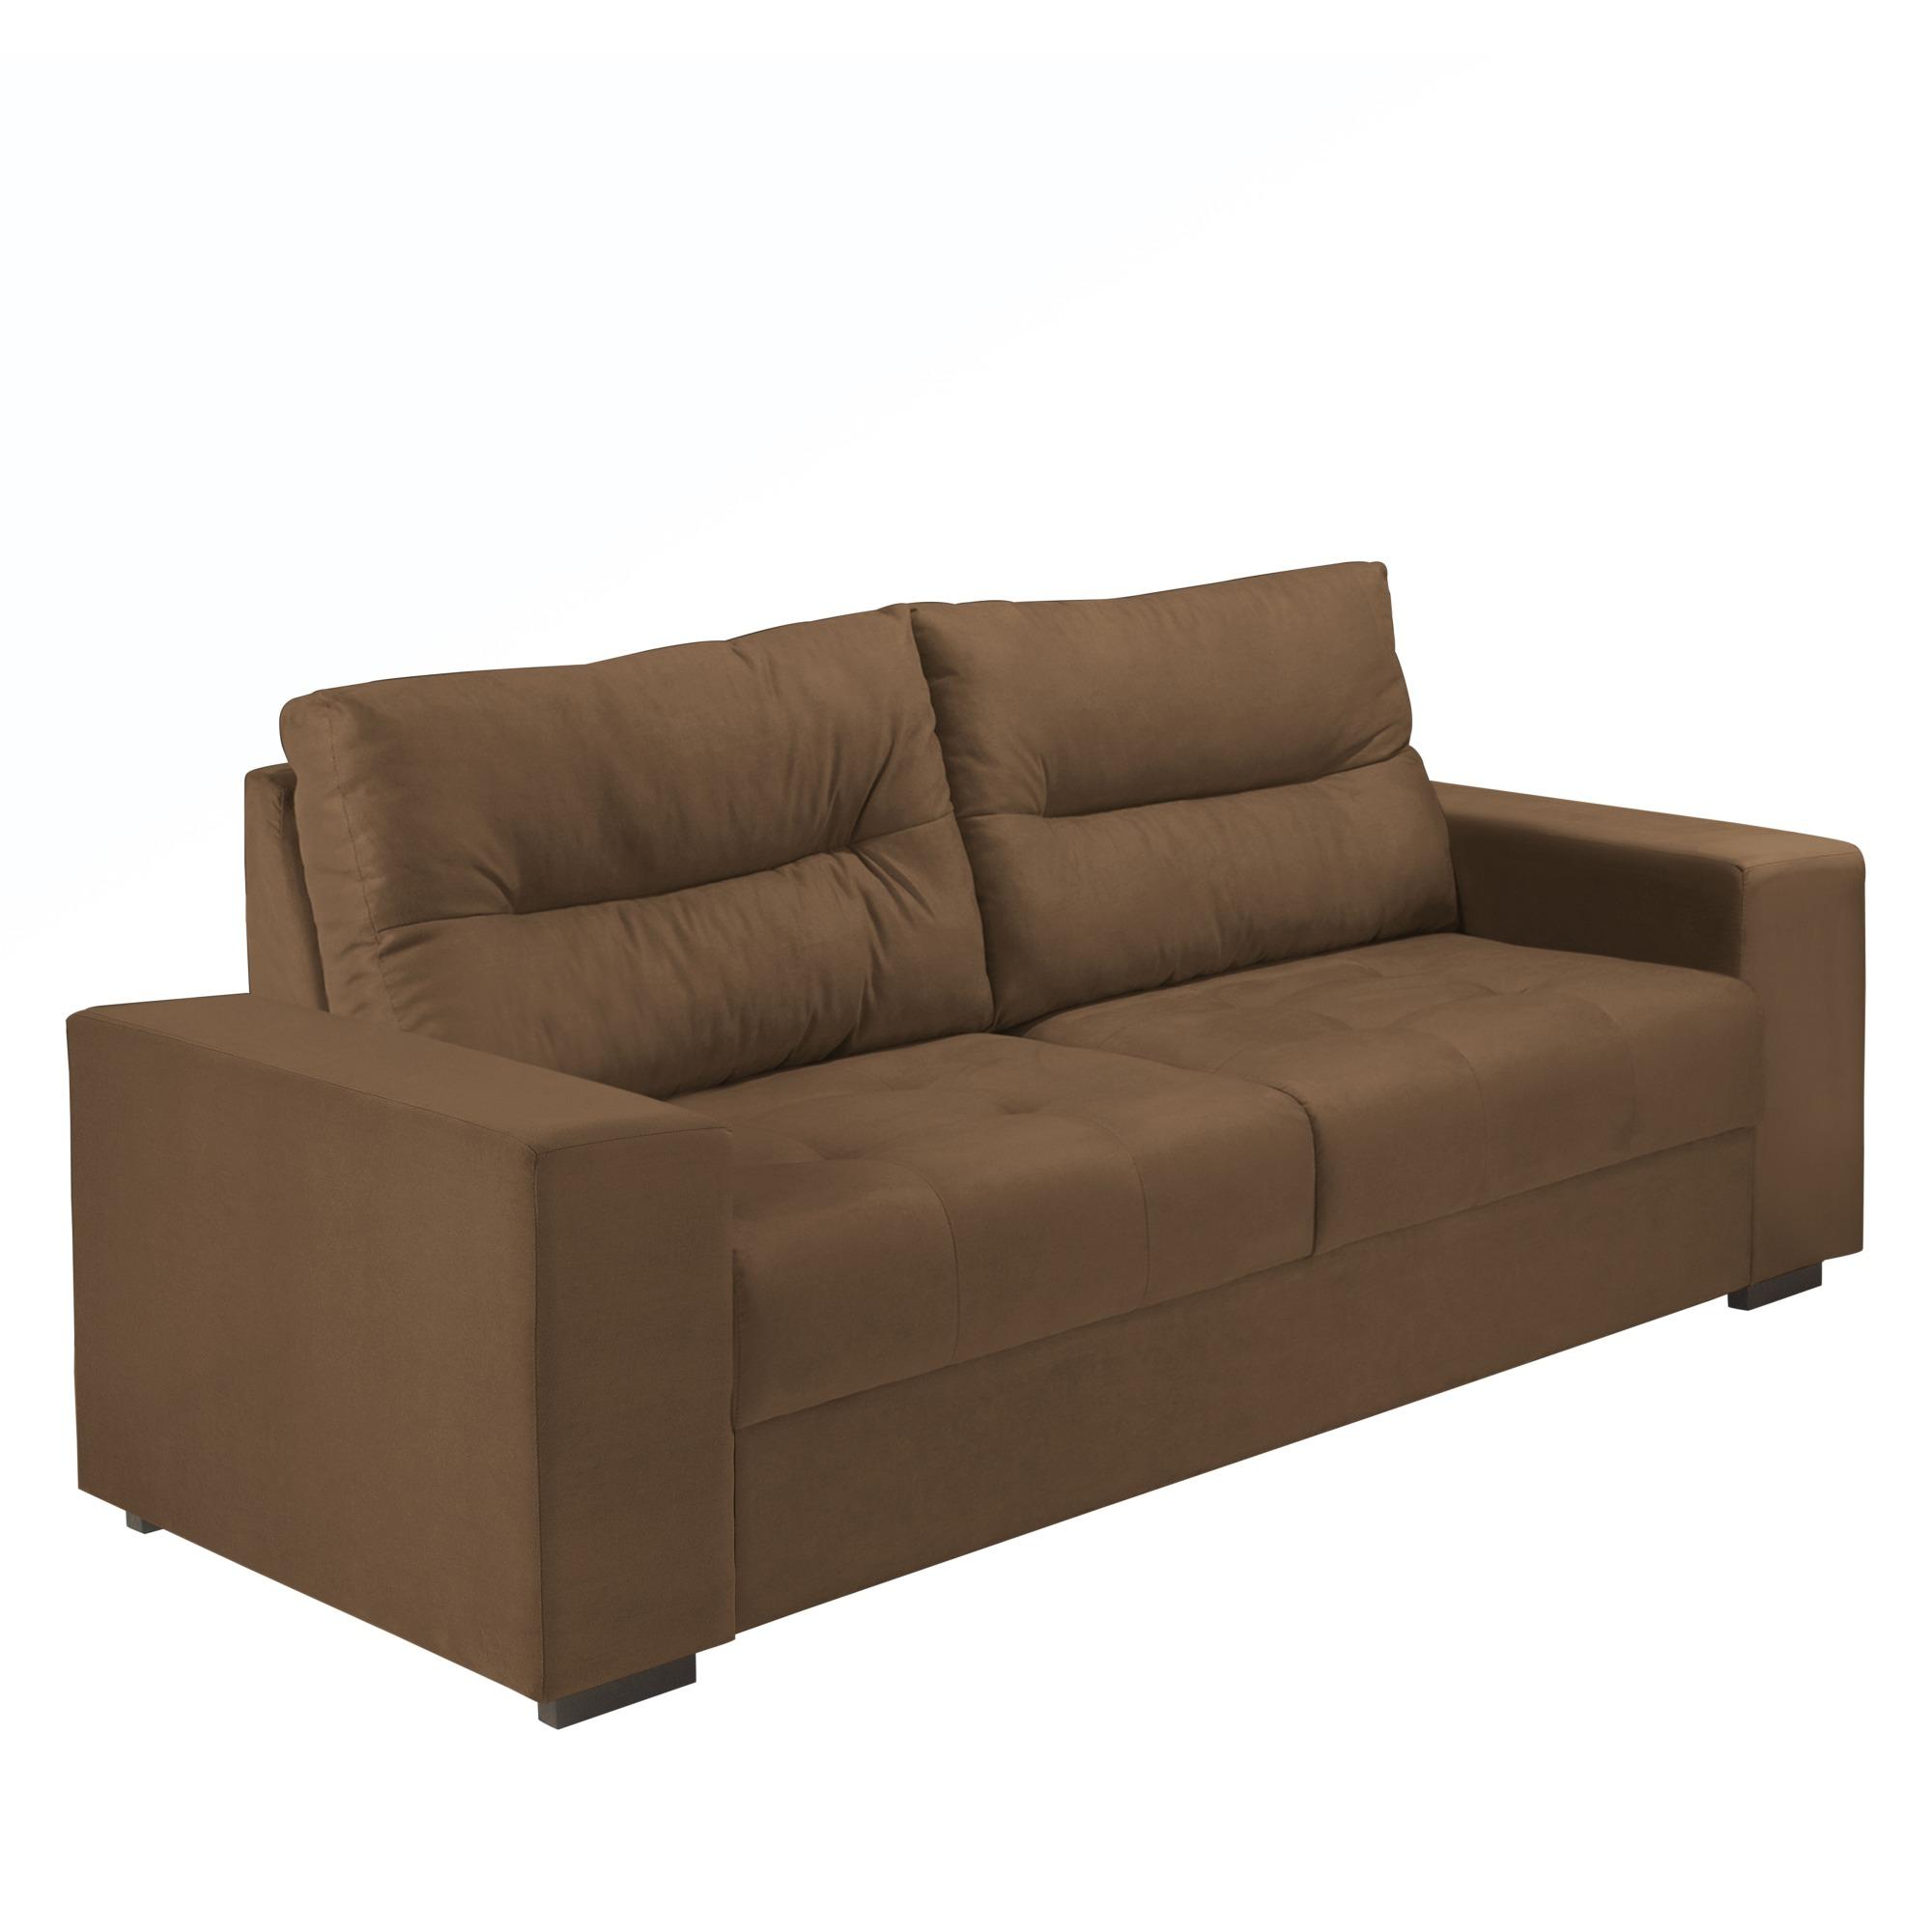 Sofa 3 Lugares Suede Marrom - Herval